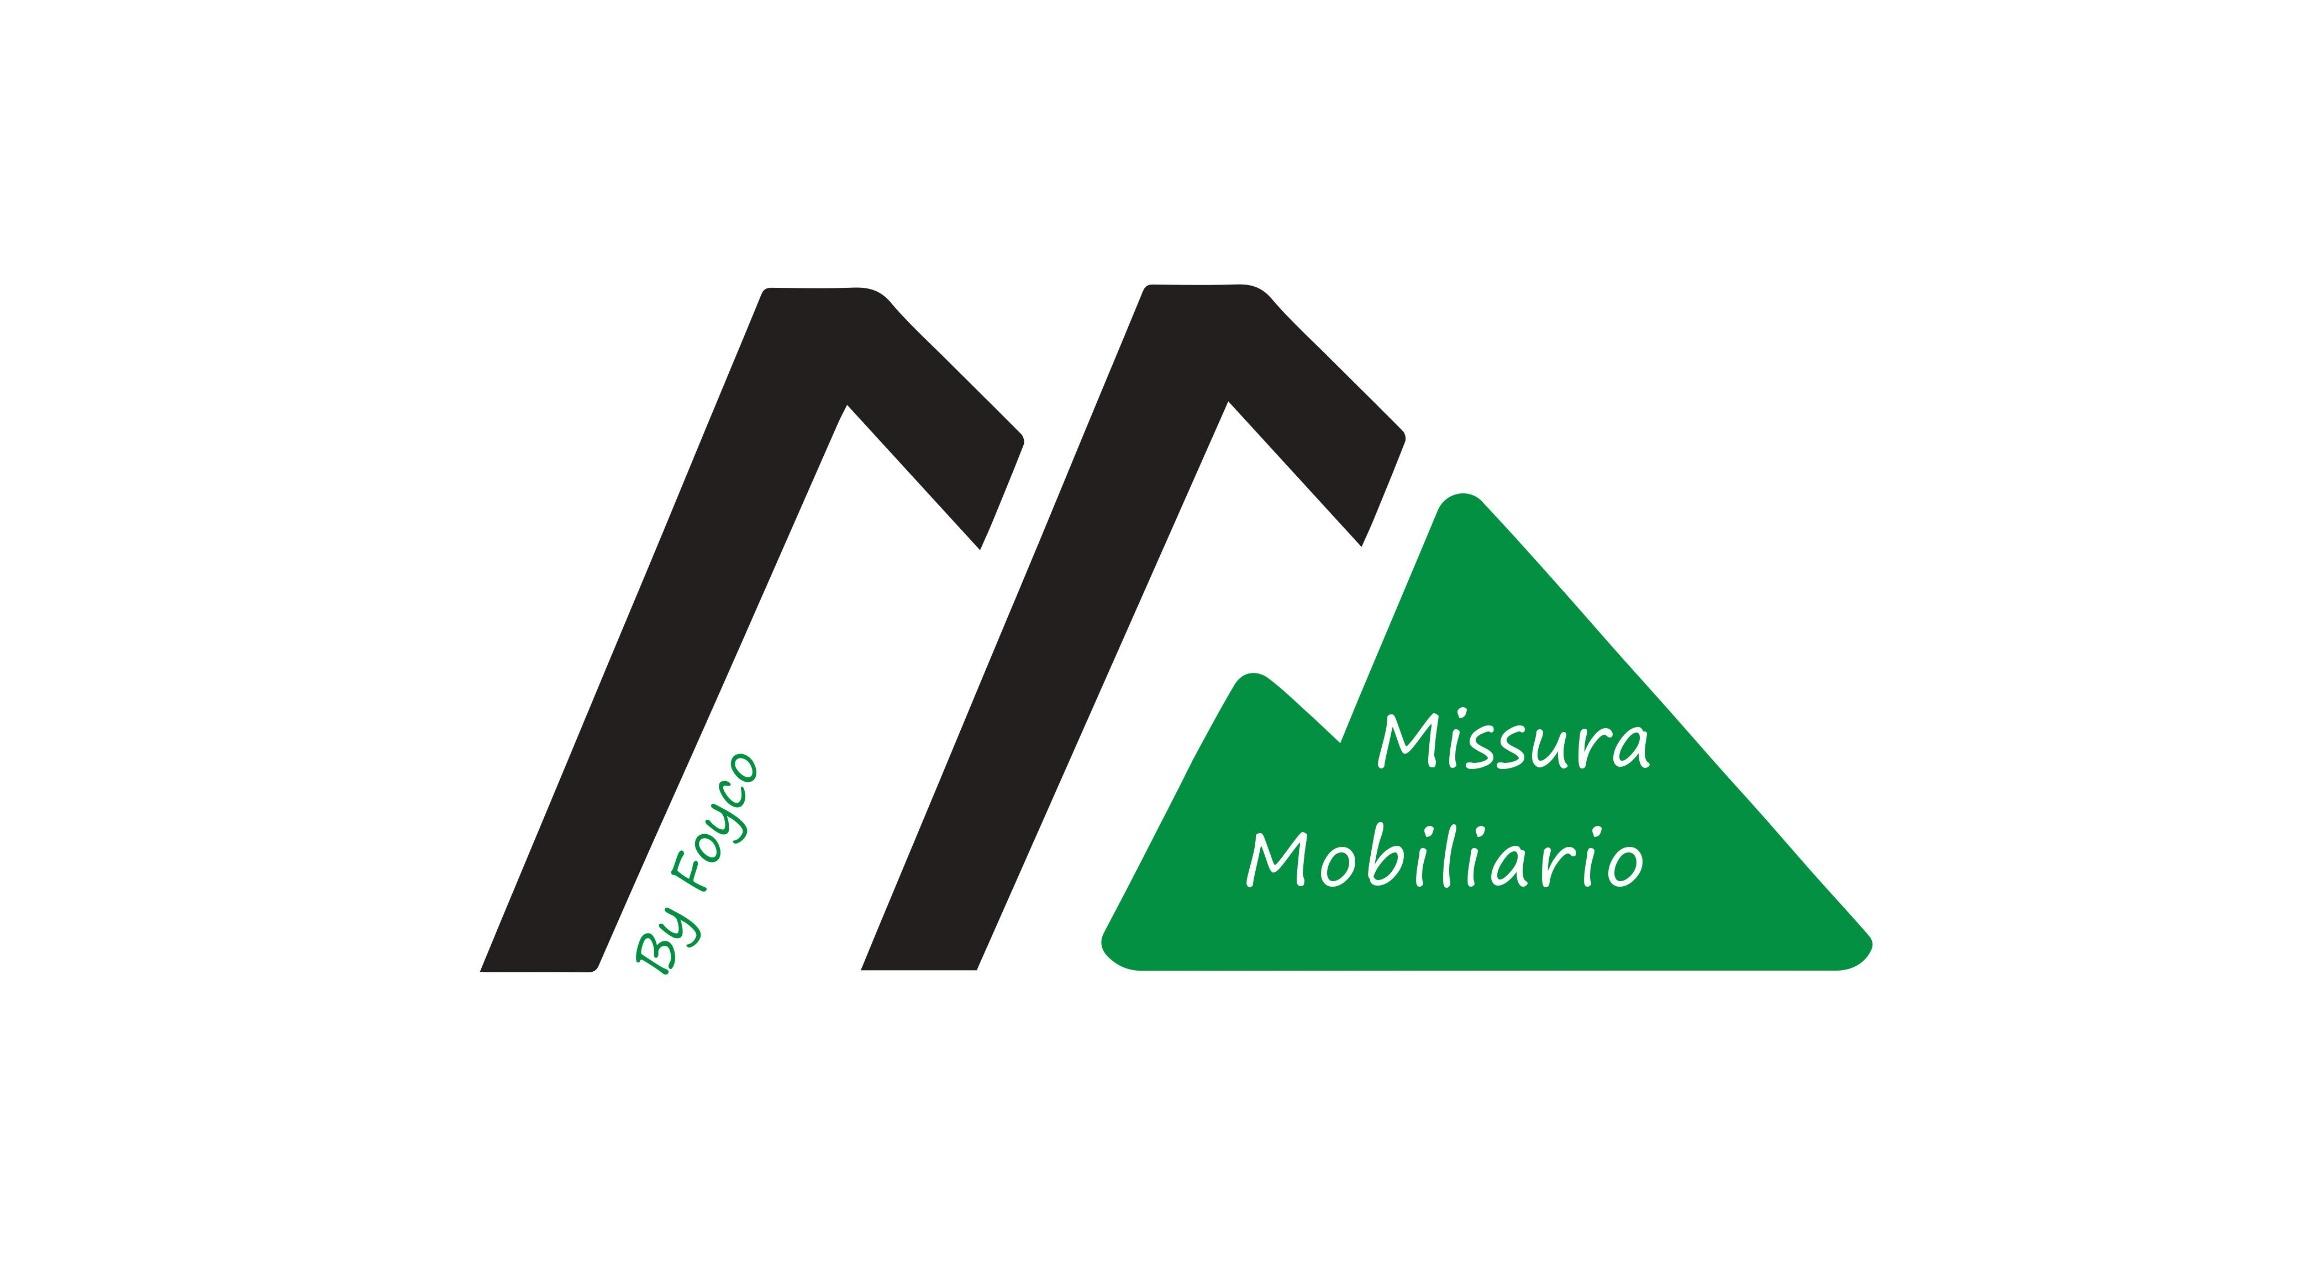 Muebles Missura - Missura Mobiliario F Brica De Muebles De Dise O A Medida[mjhdah]https://sc01.alicdn.com/kf/HTB123VMfDJYBeNjy1zeq6yhzVXaX.jpg